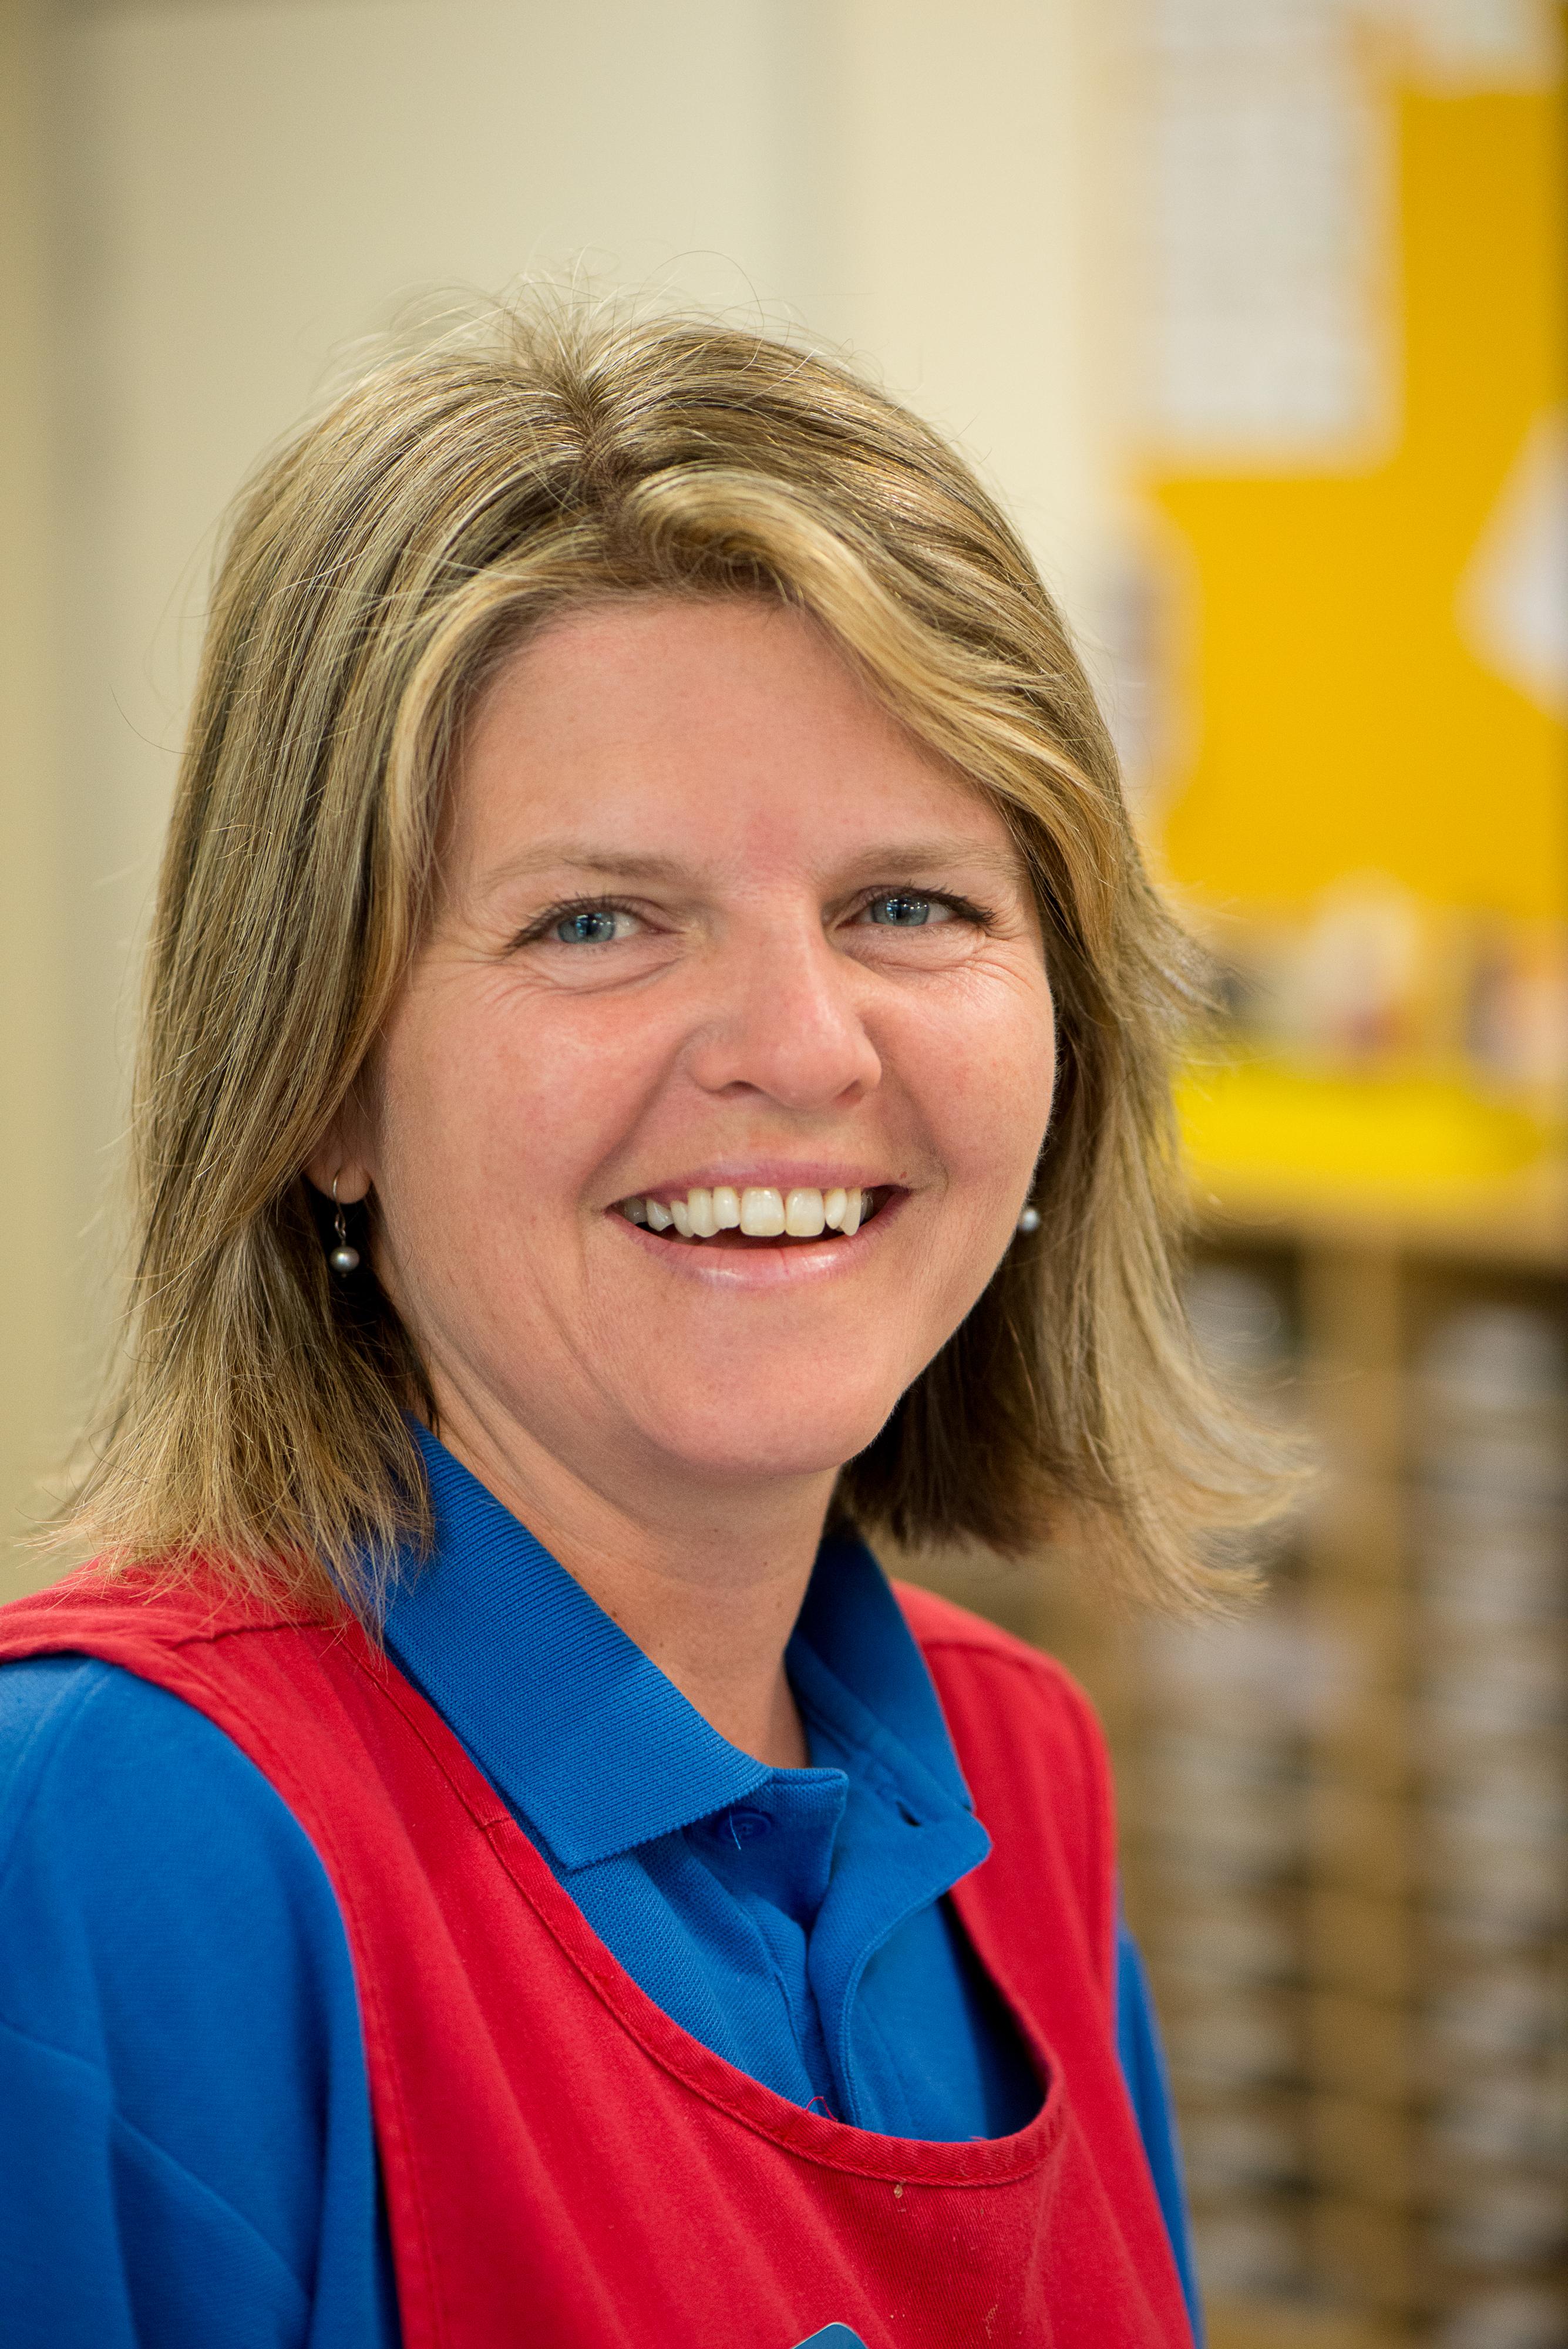 Deborah Field